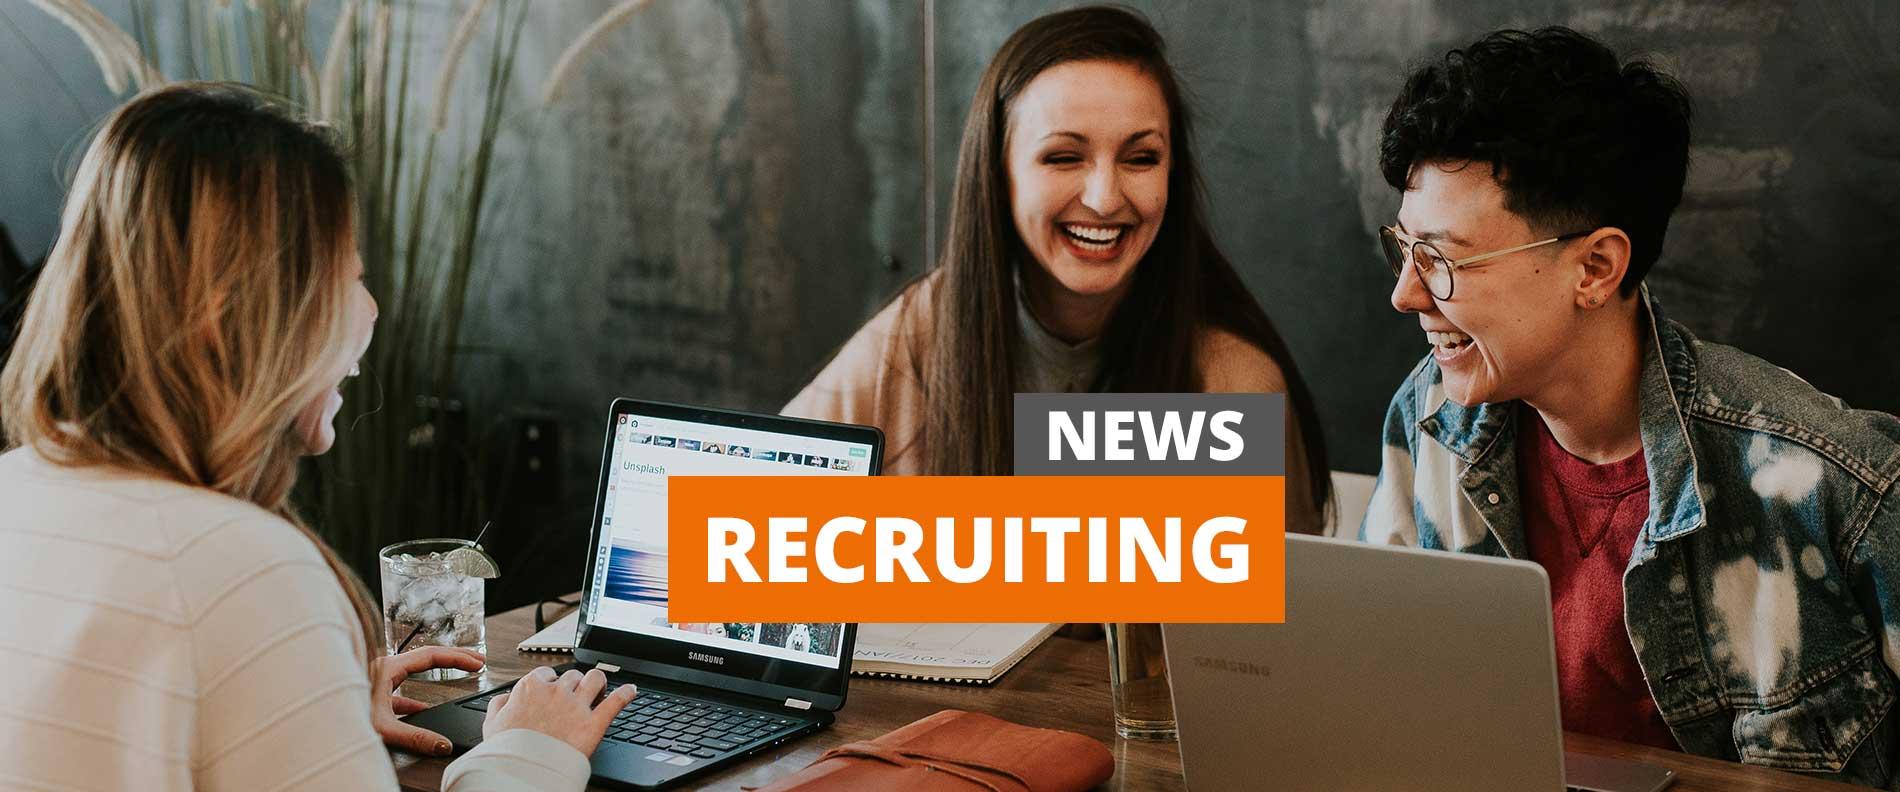 recruiting-news_2019-04-09